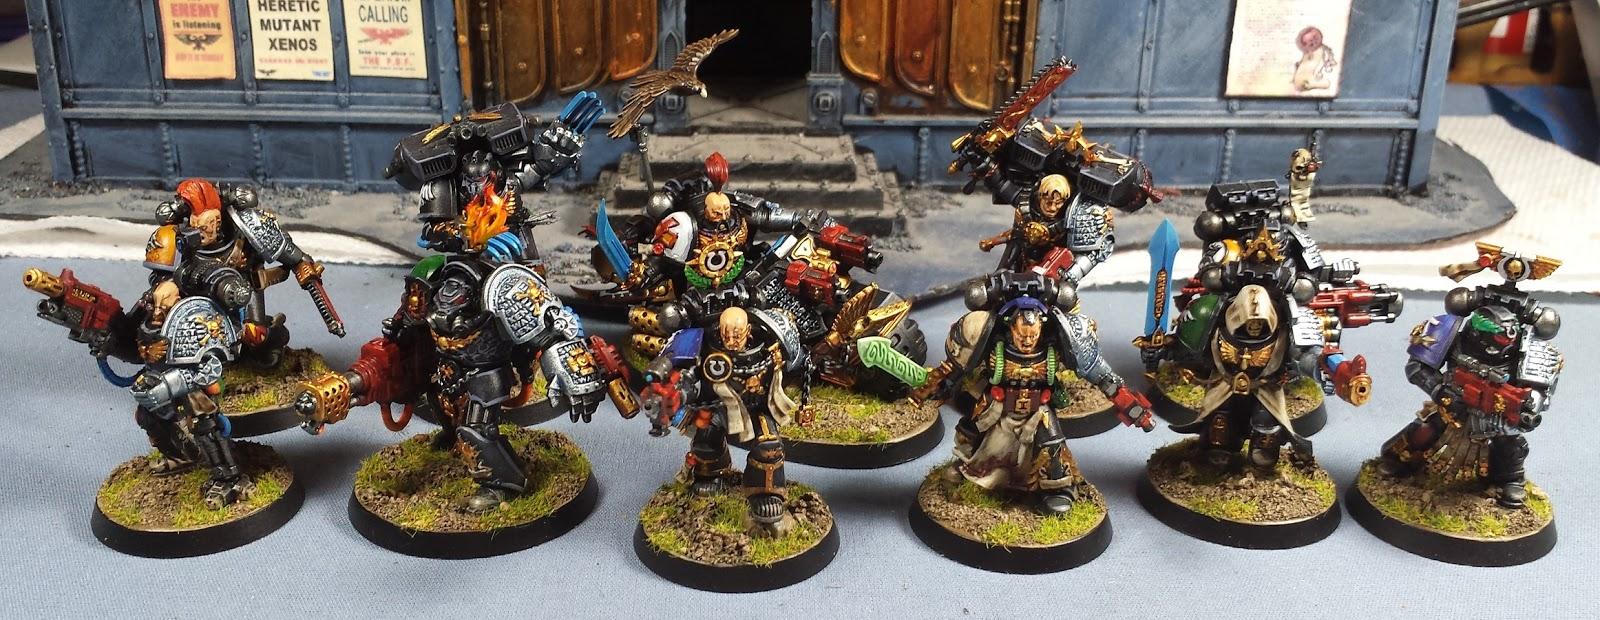 Shadow War Astra Militarum Kill Team Build